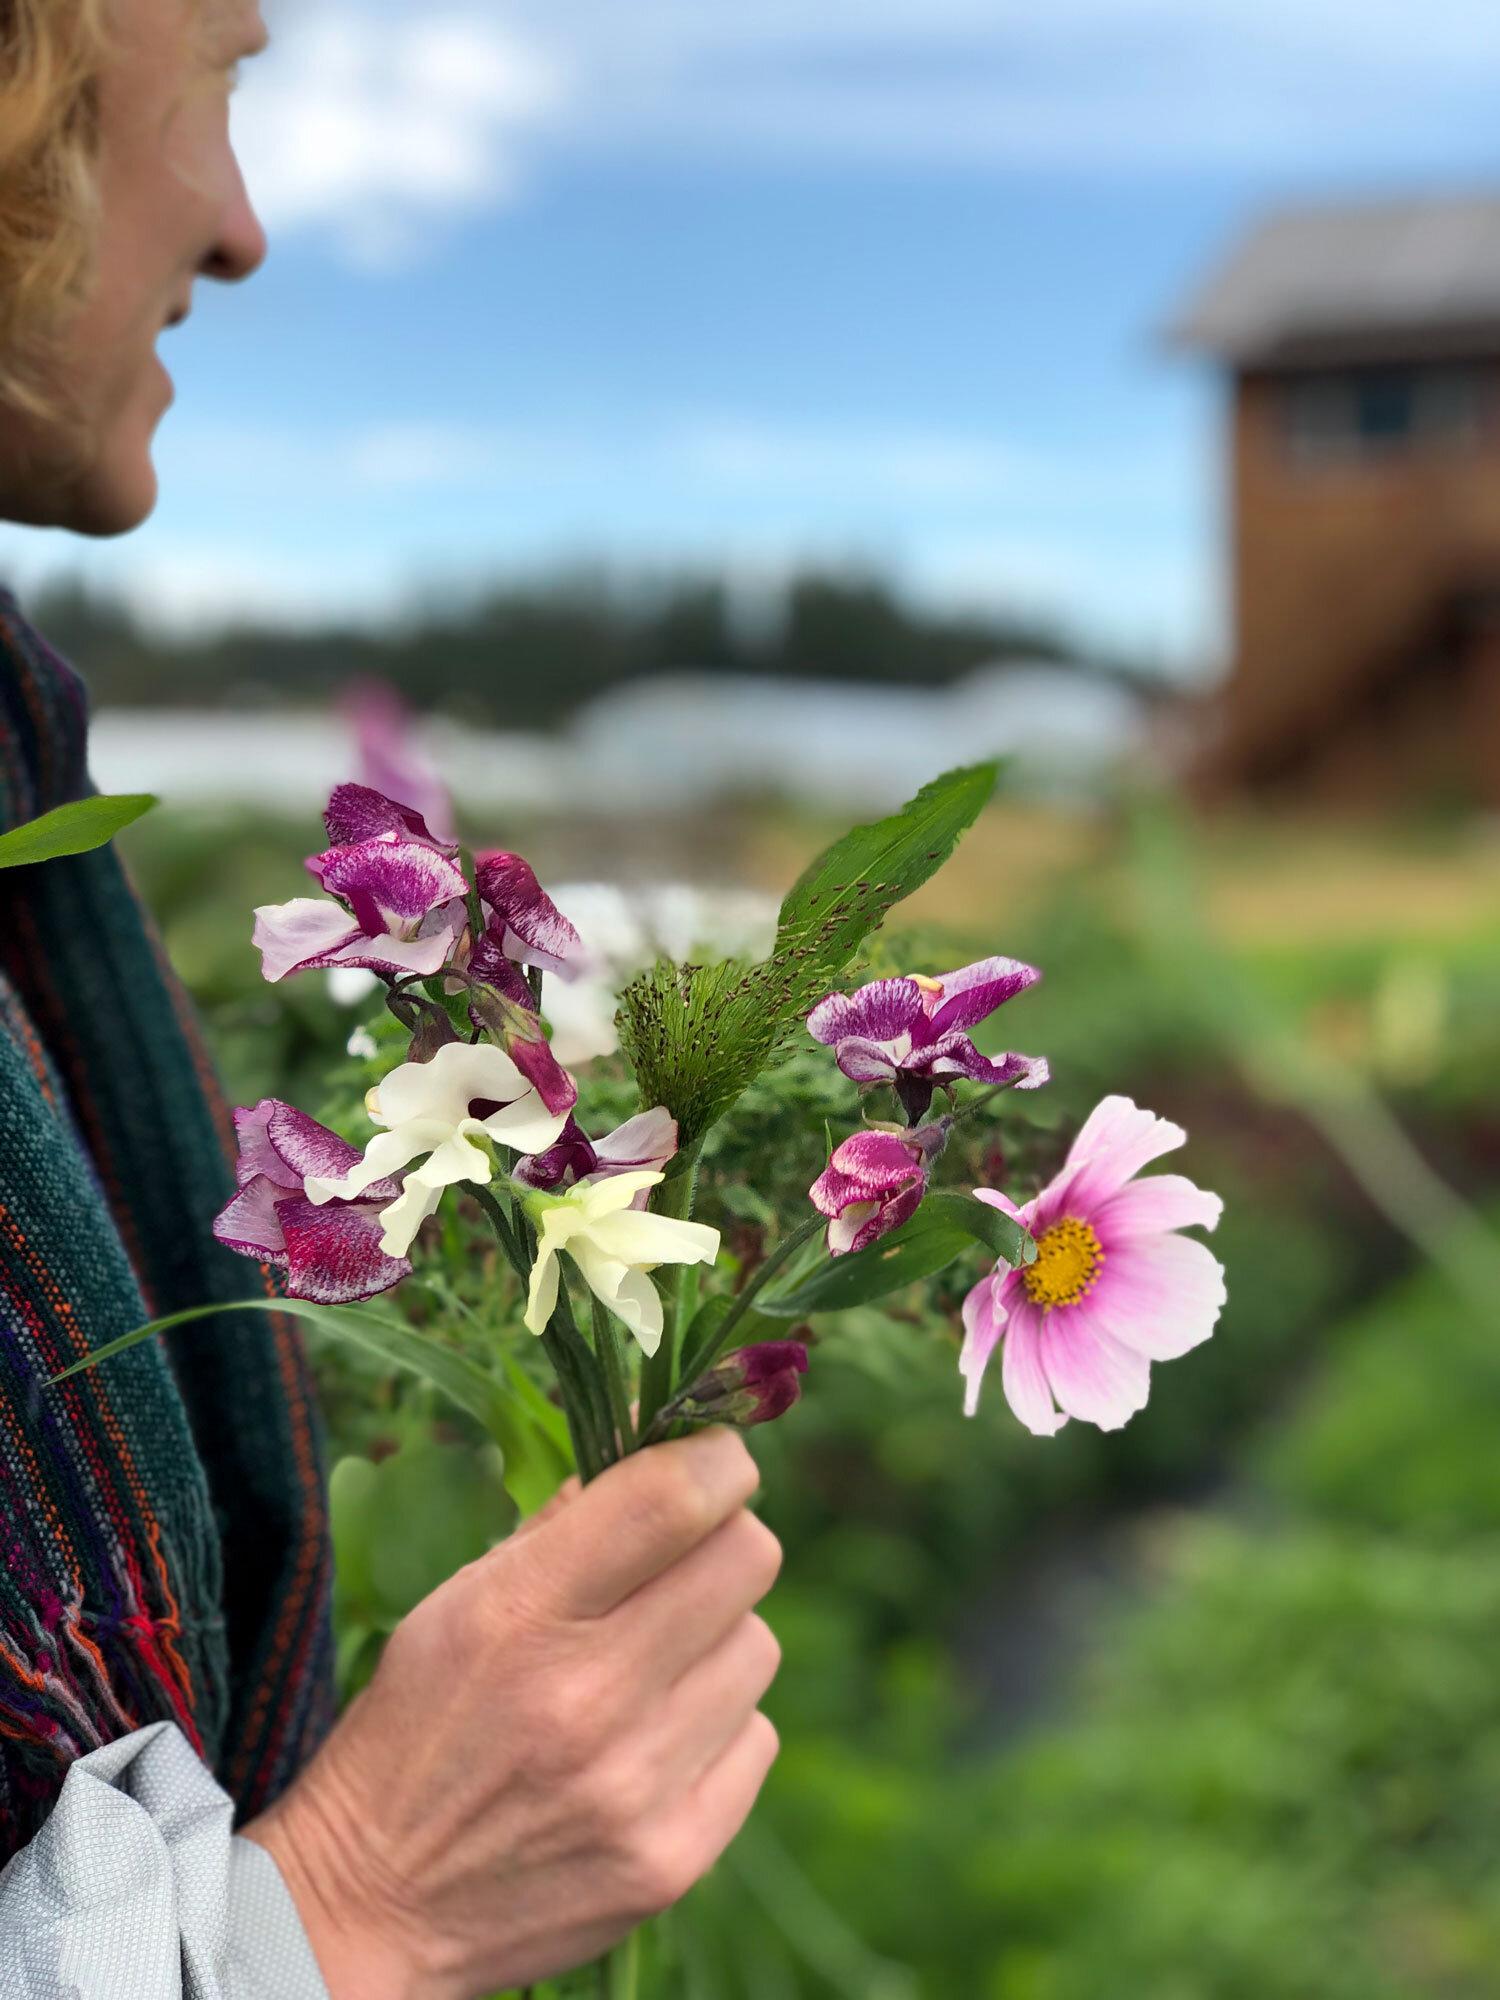 Impromptu hand-picked bouquet